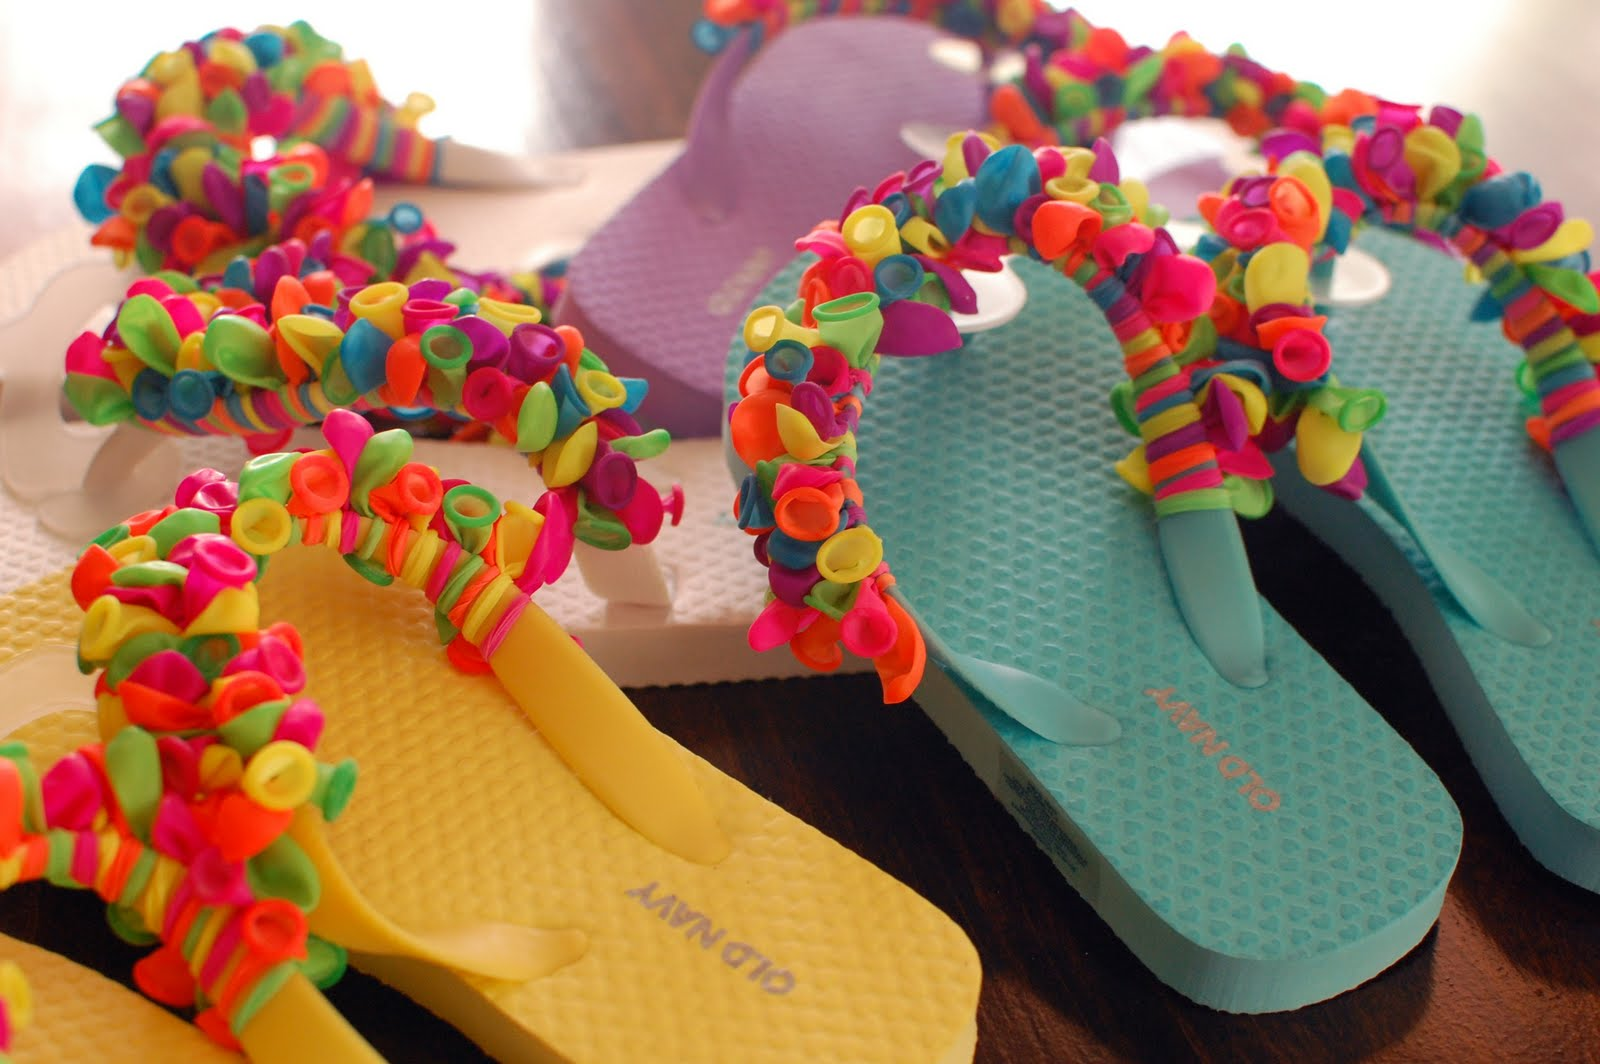 91 Summer Craft Ideas For Kids To Make Summer Craft Ideas For Kids